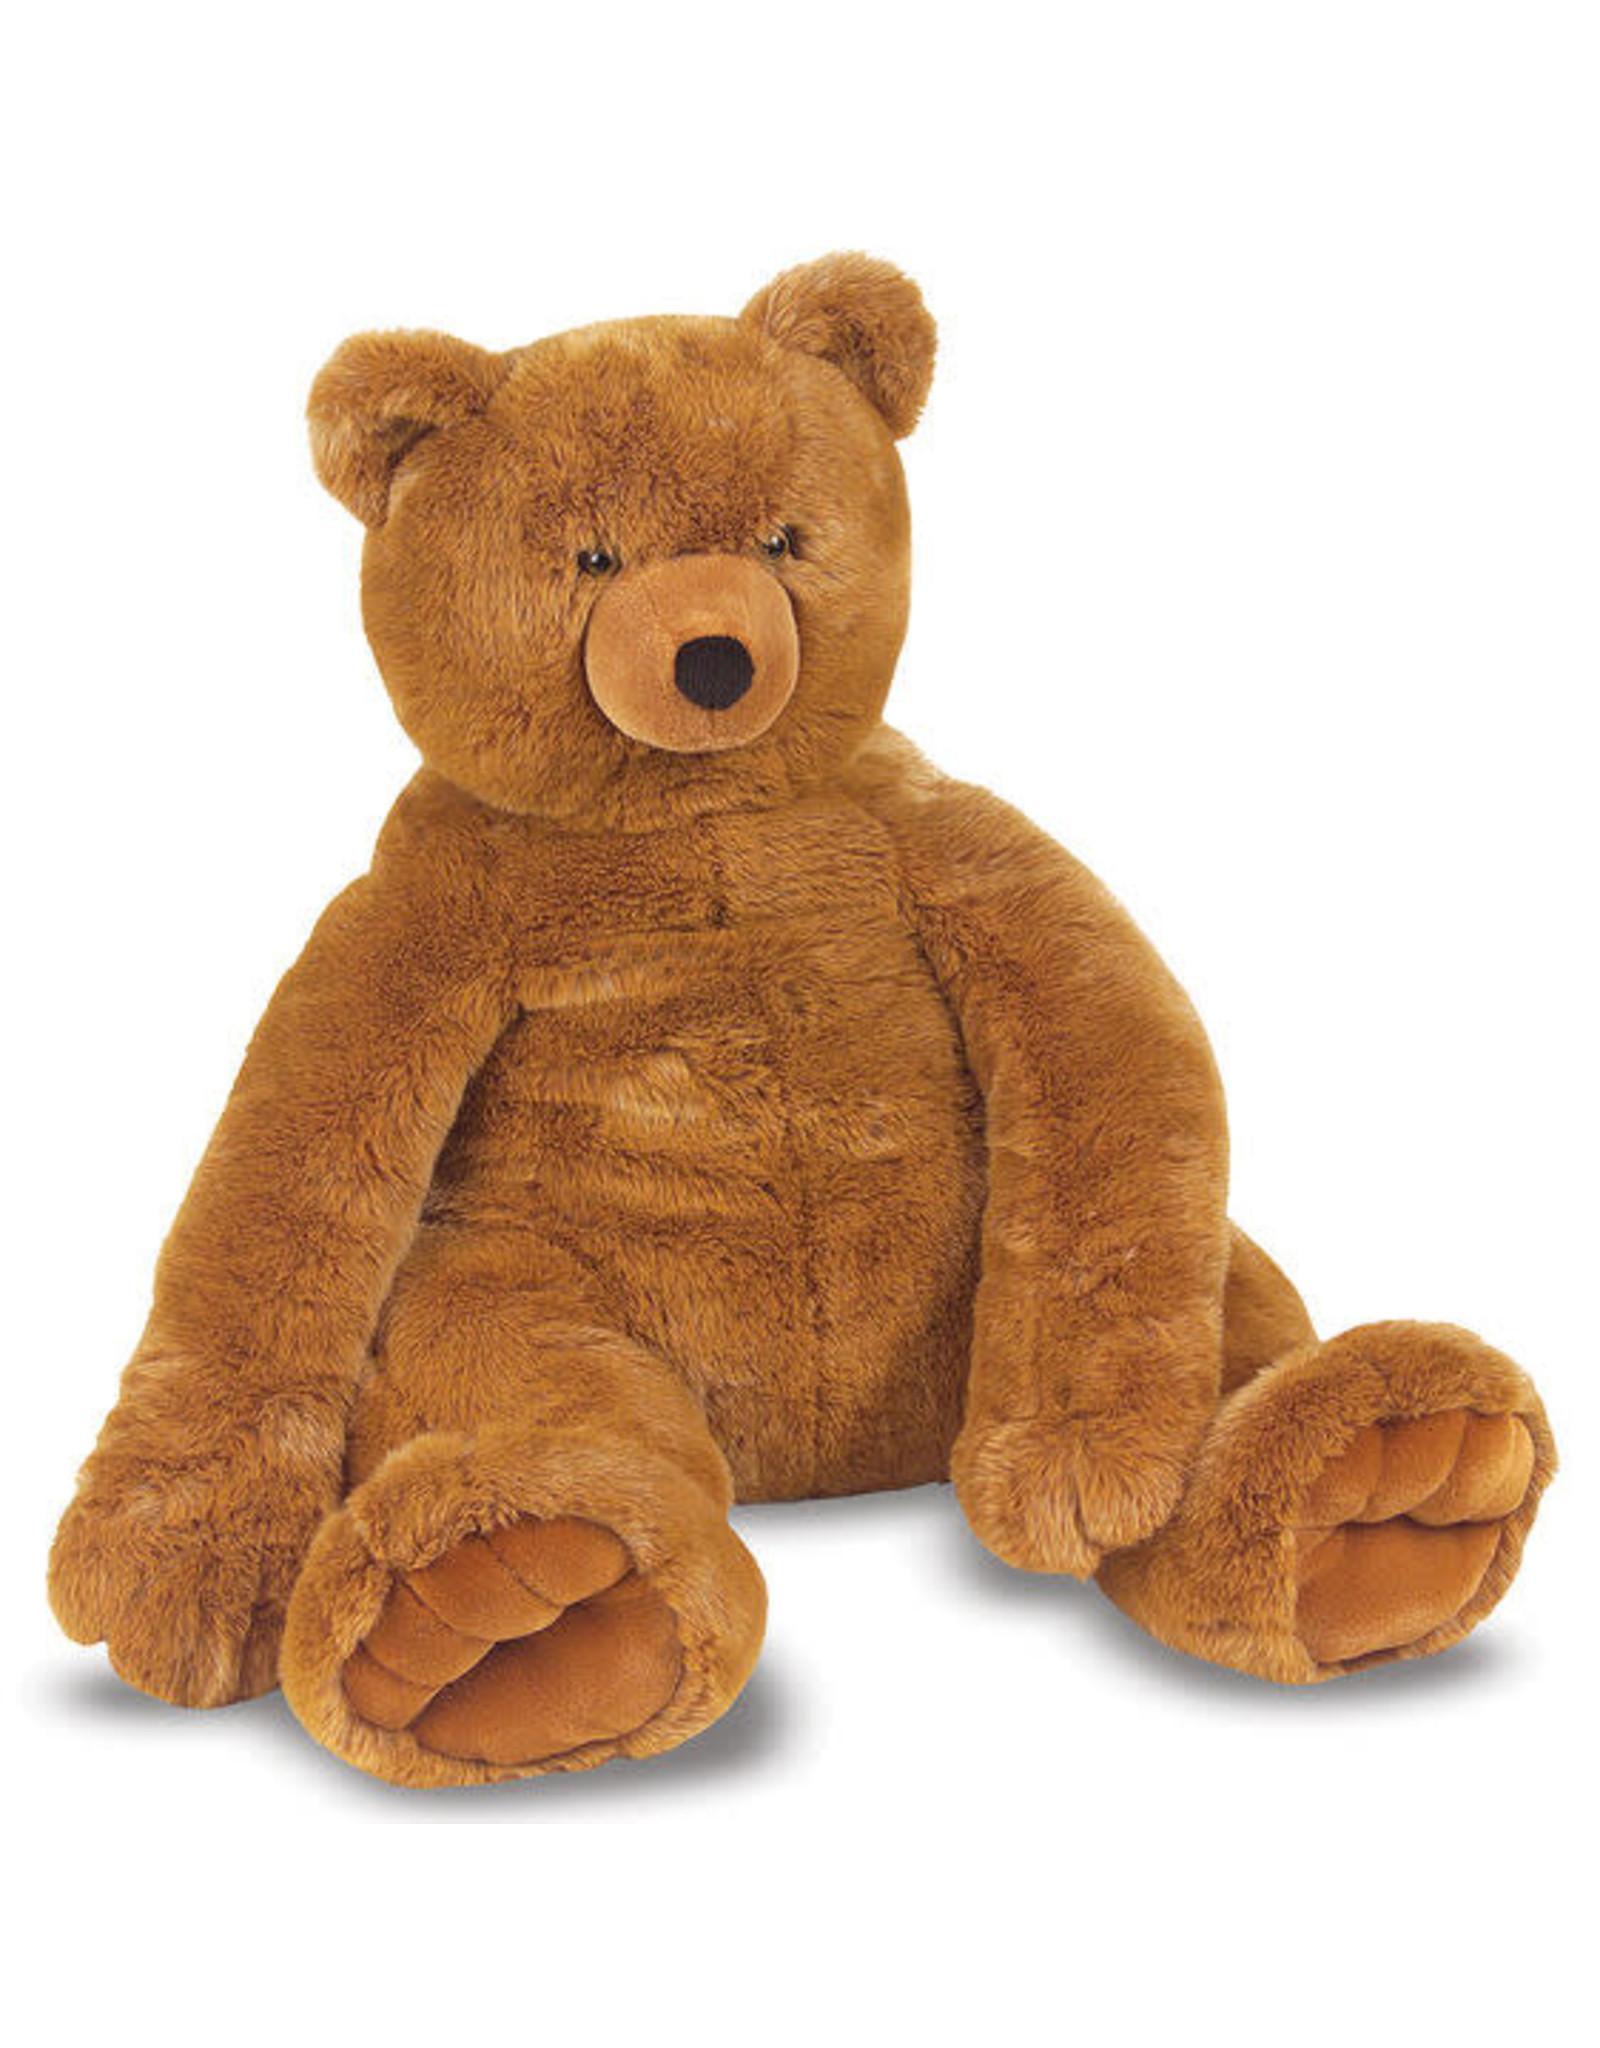 Melissa & Doug Jumbo Teddy Bear Plush